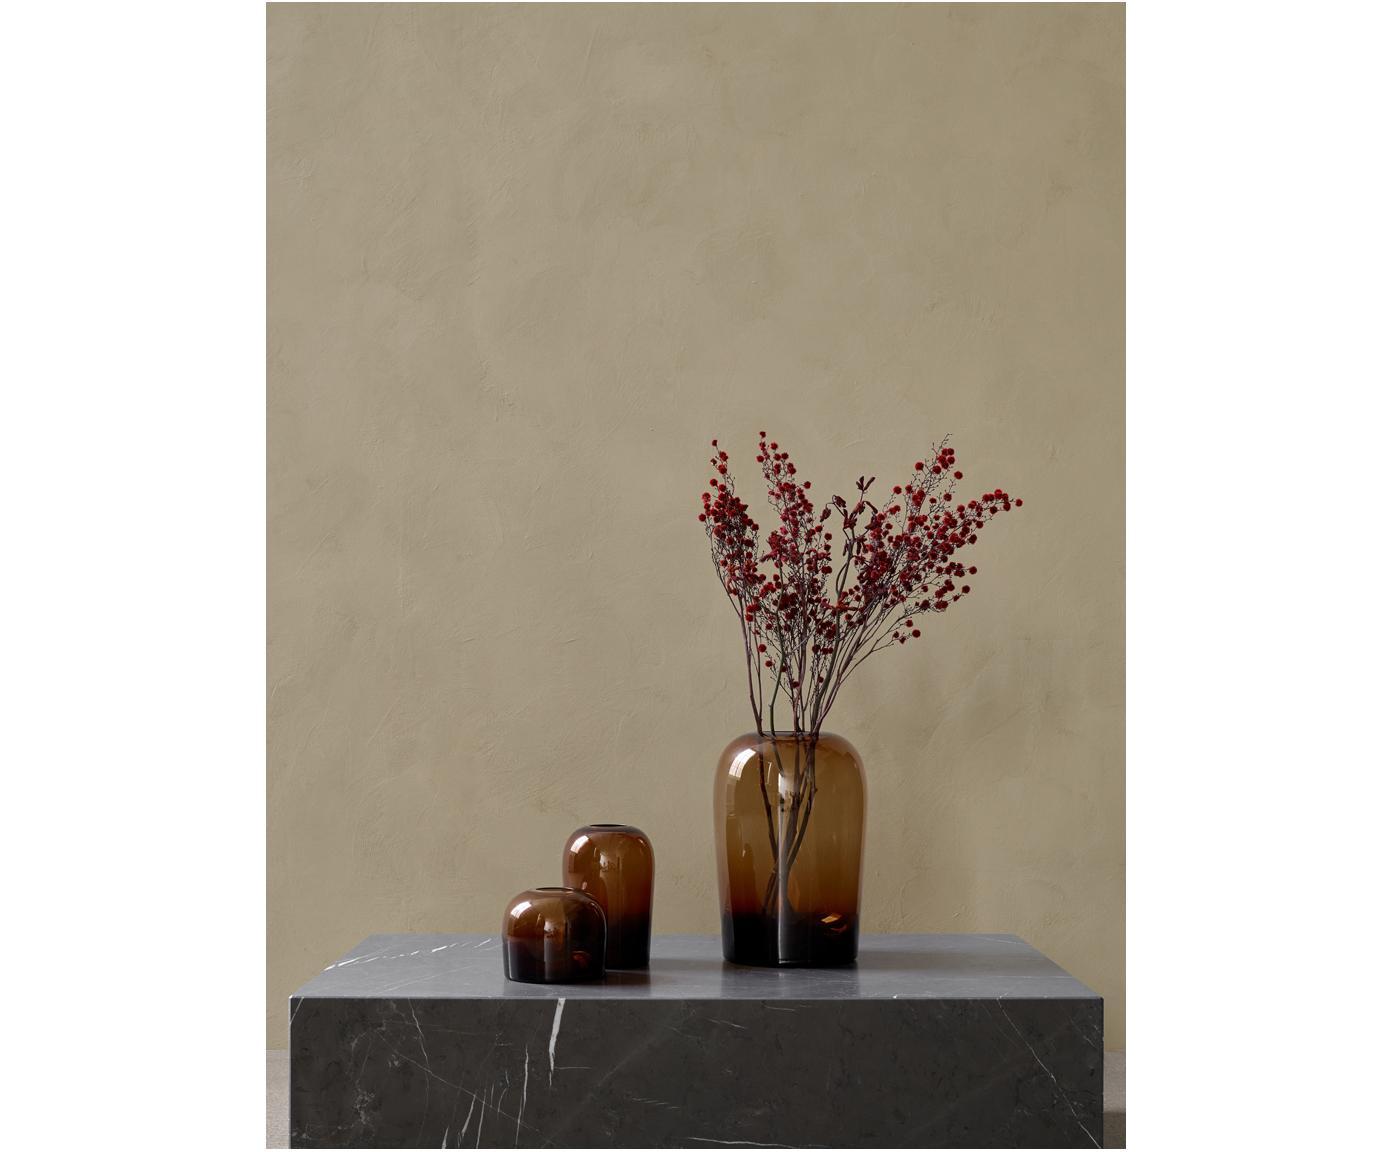 Mundgeblasene Vase Troll, Glas, mundgeblasen, Bernsteinfarben, Ø 13 x H 19 cm